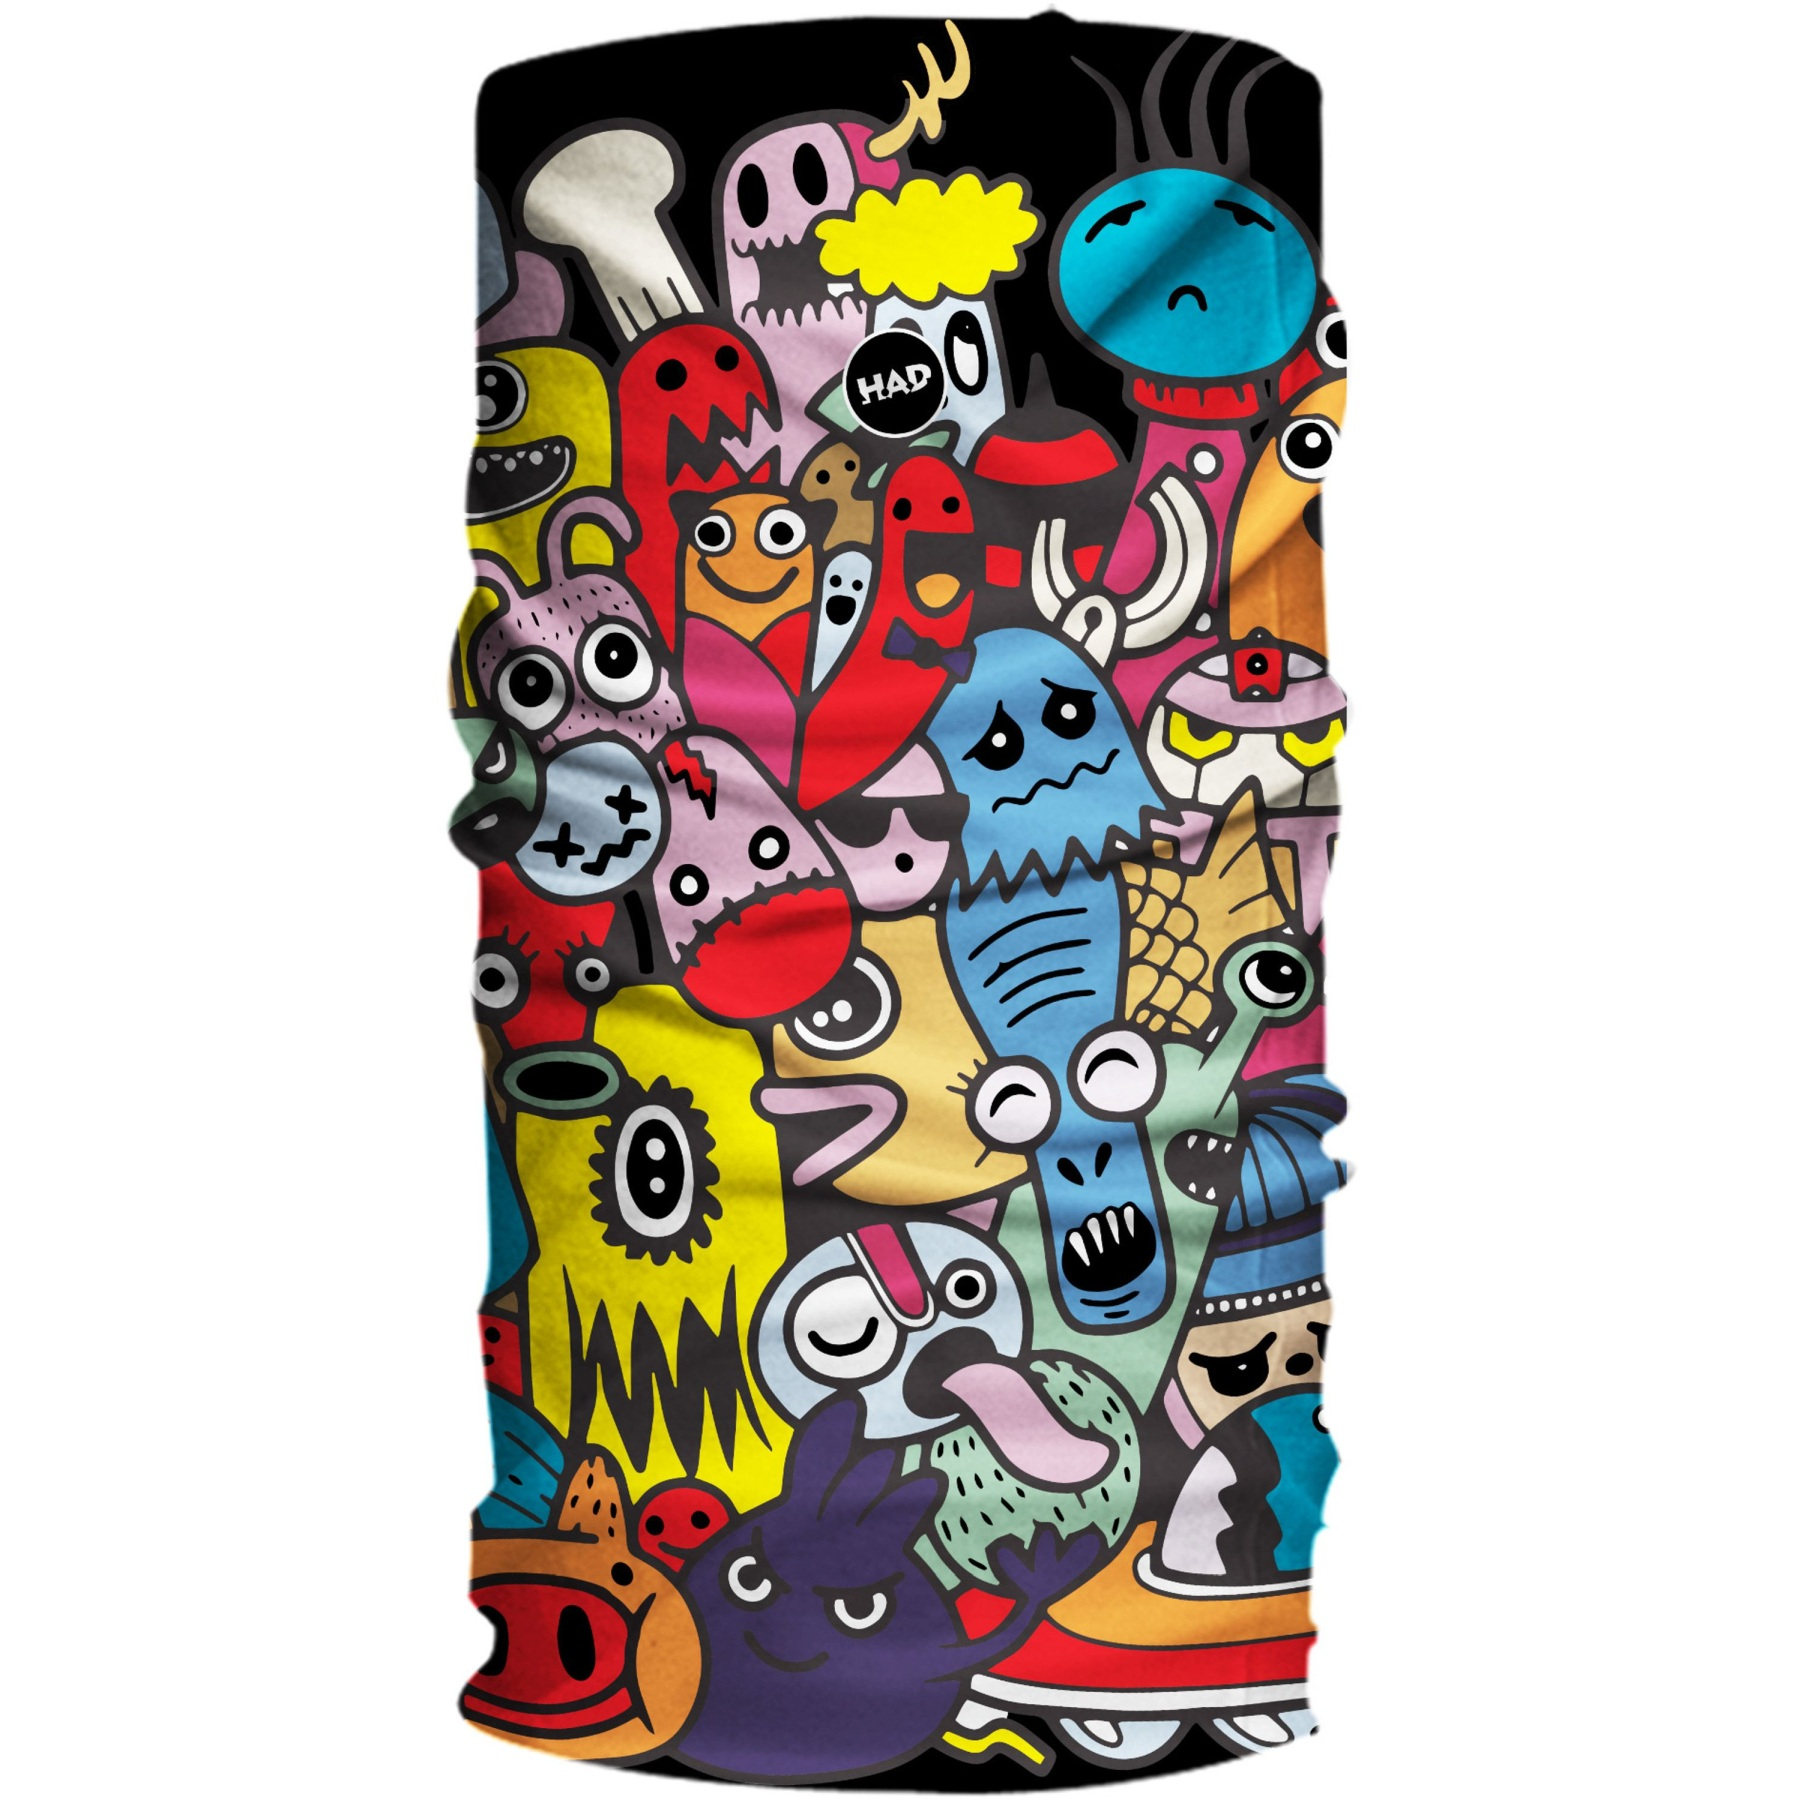 HAD Originals Kids Multifunctional Cloth - Monster Friends